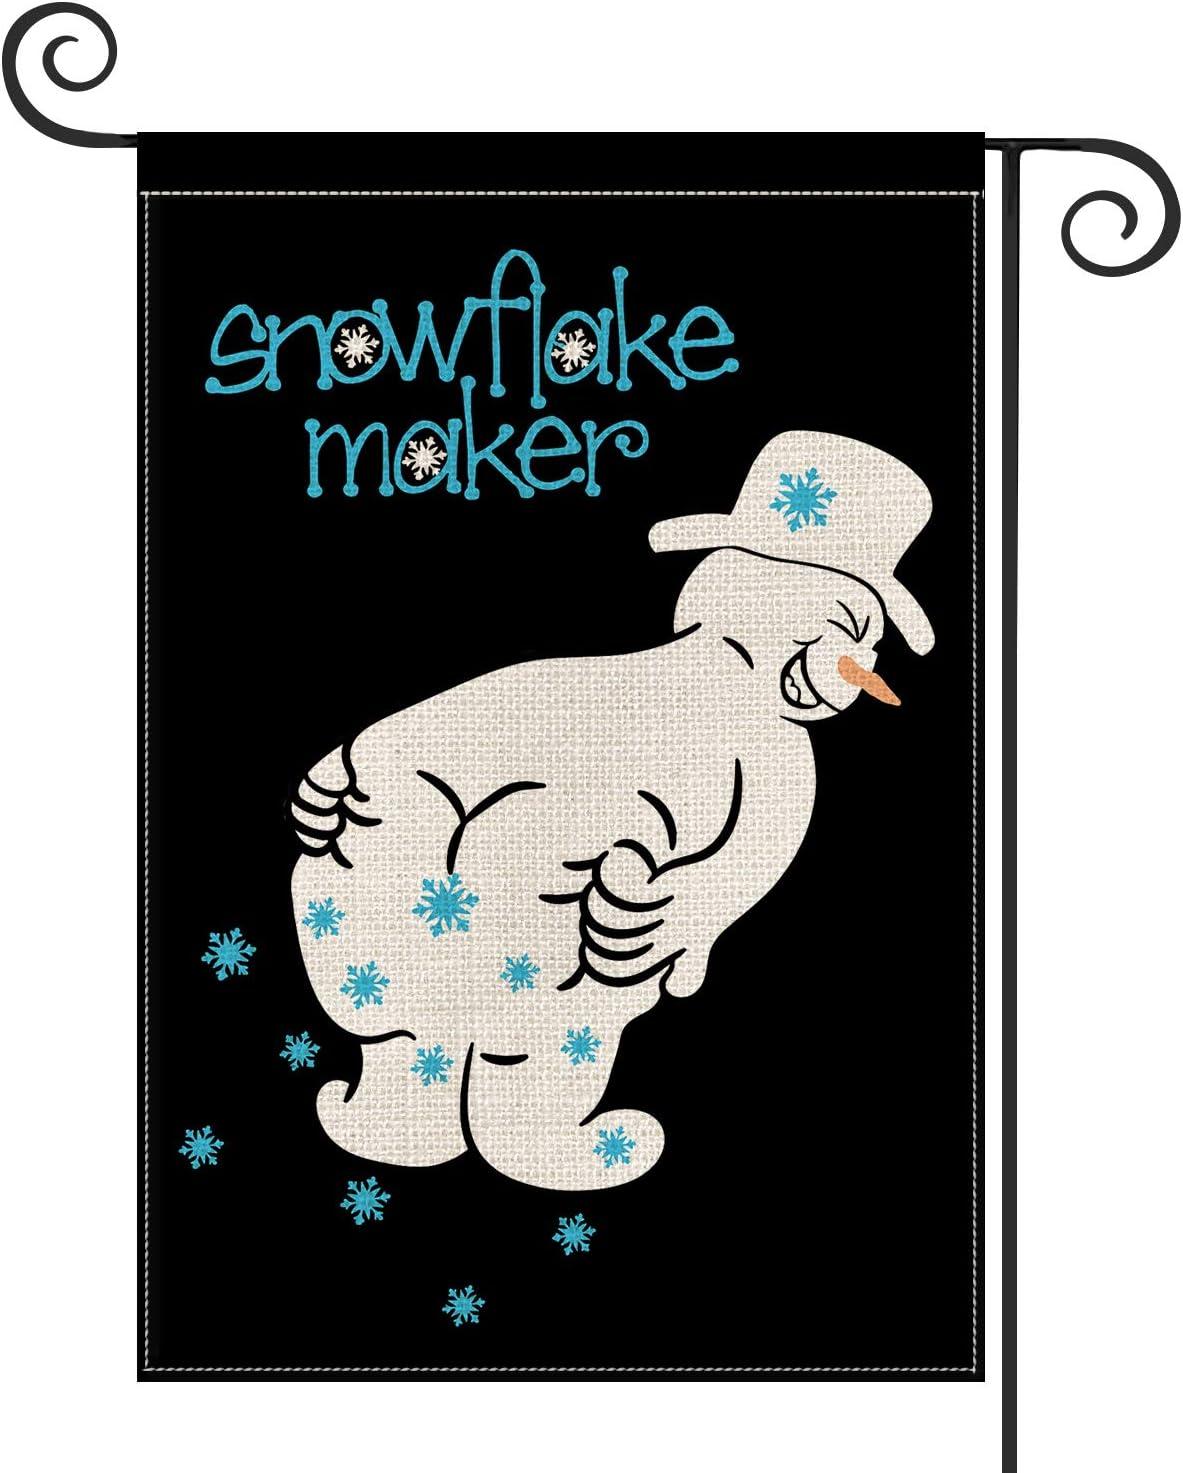 Avoin Snowflake Maker Garden Flag Vertical Double Sized Christmas Winter Holiday Snowman Yard Outdoor Decoration 12 5 X 18 Inch Garden Outdoor